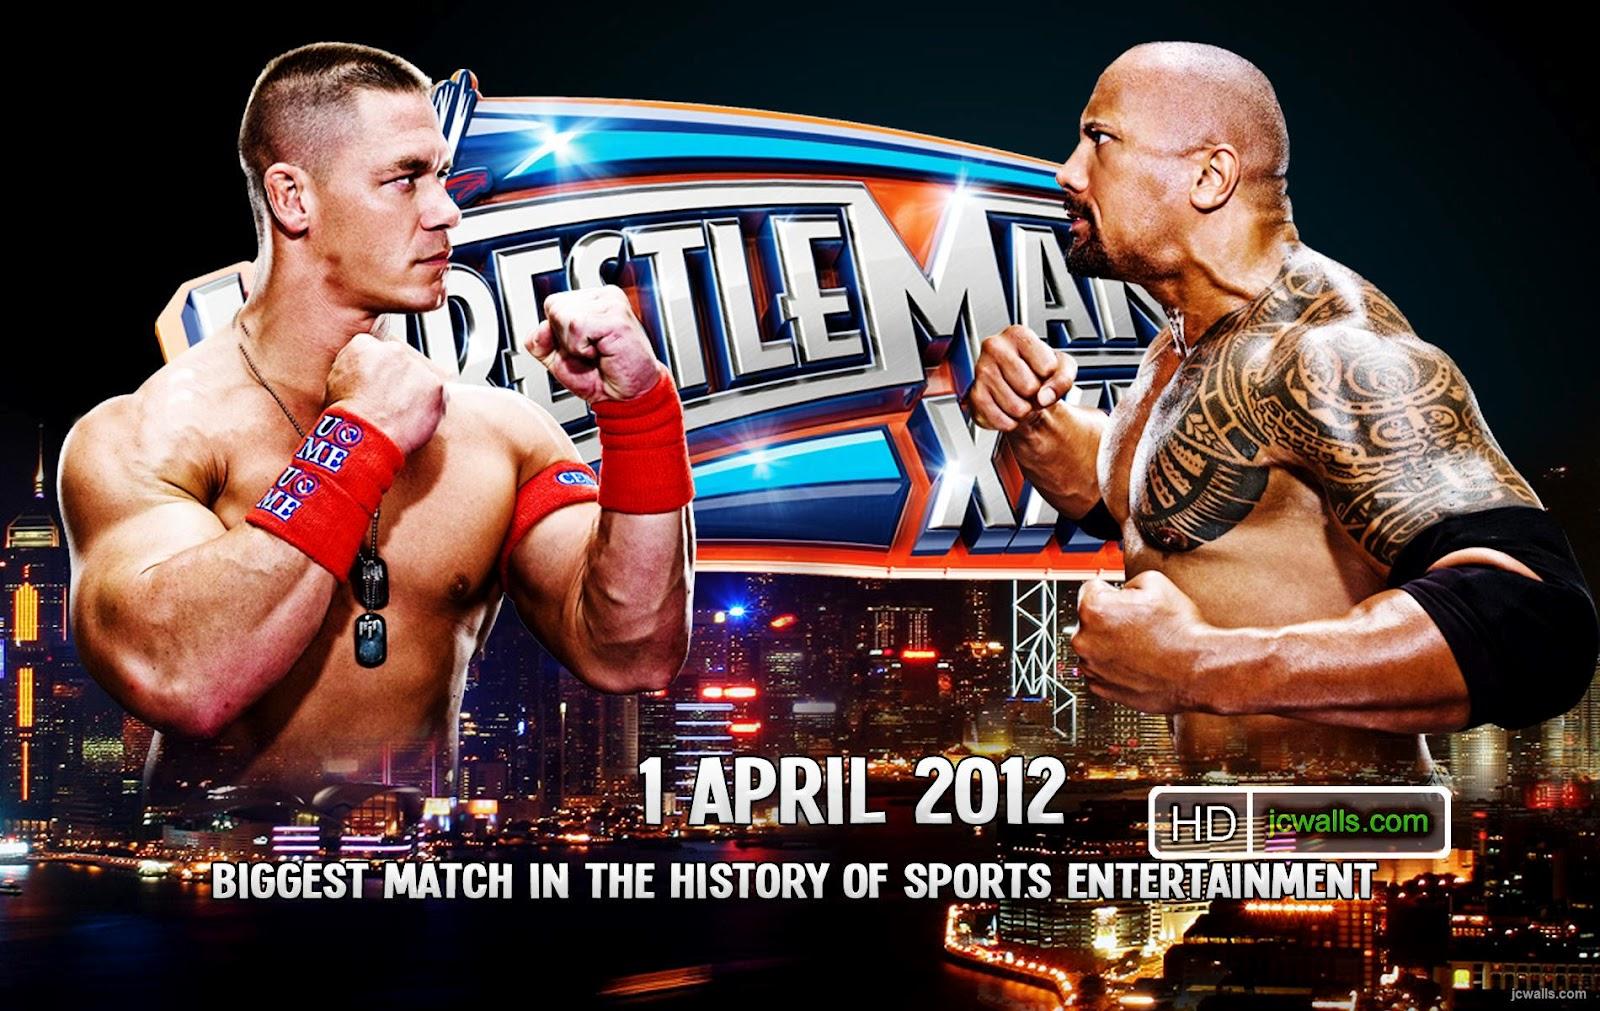 http://3.bp.blogspot.com/-mdk4YVj3JDA/T4HYaxs0RWI/AAAAAAAAG1A/KzL1uiHUD0c/s1600/wwe-Wrestlemania+28-cena+vs+rock.jpg